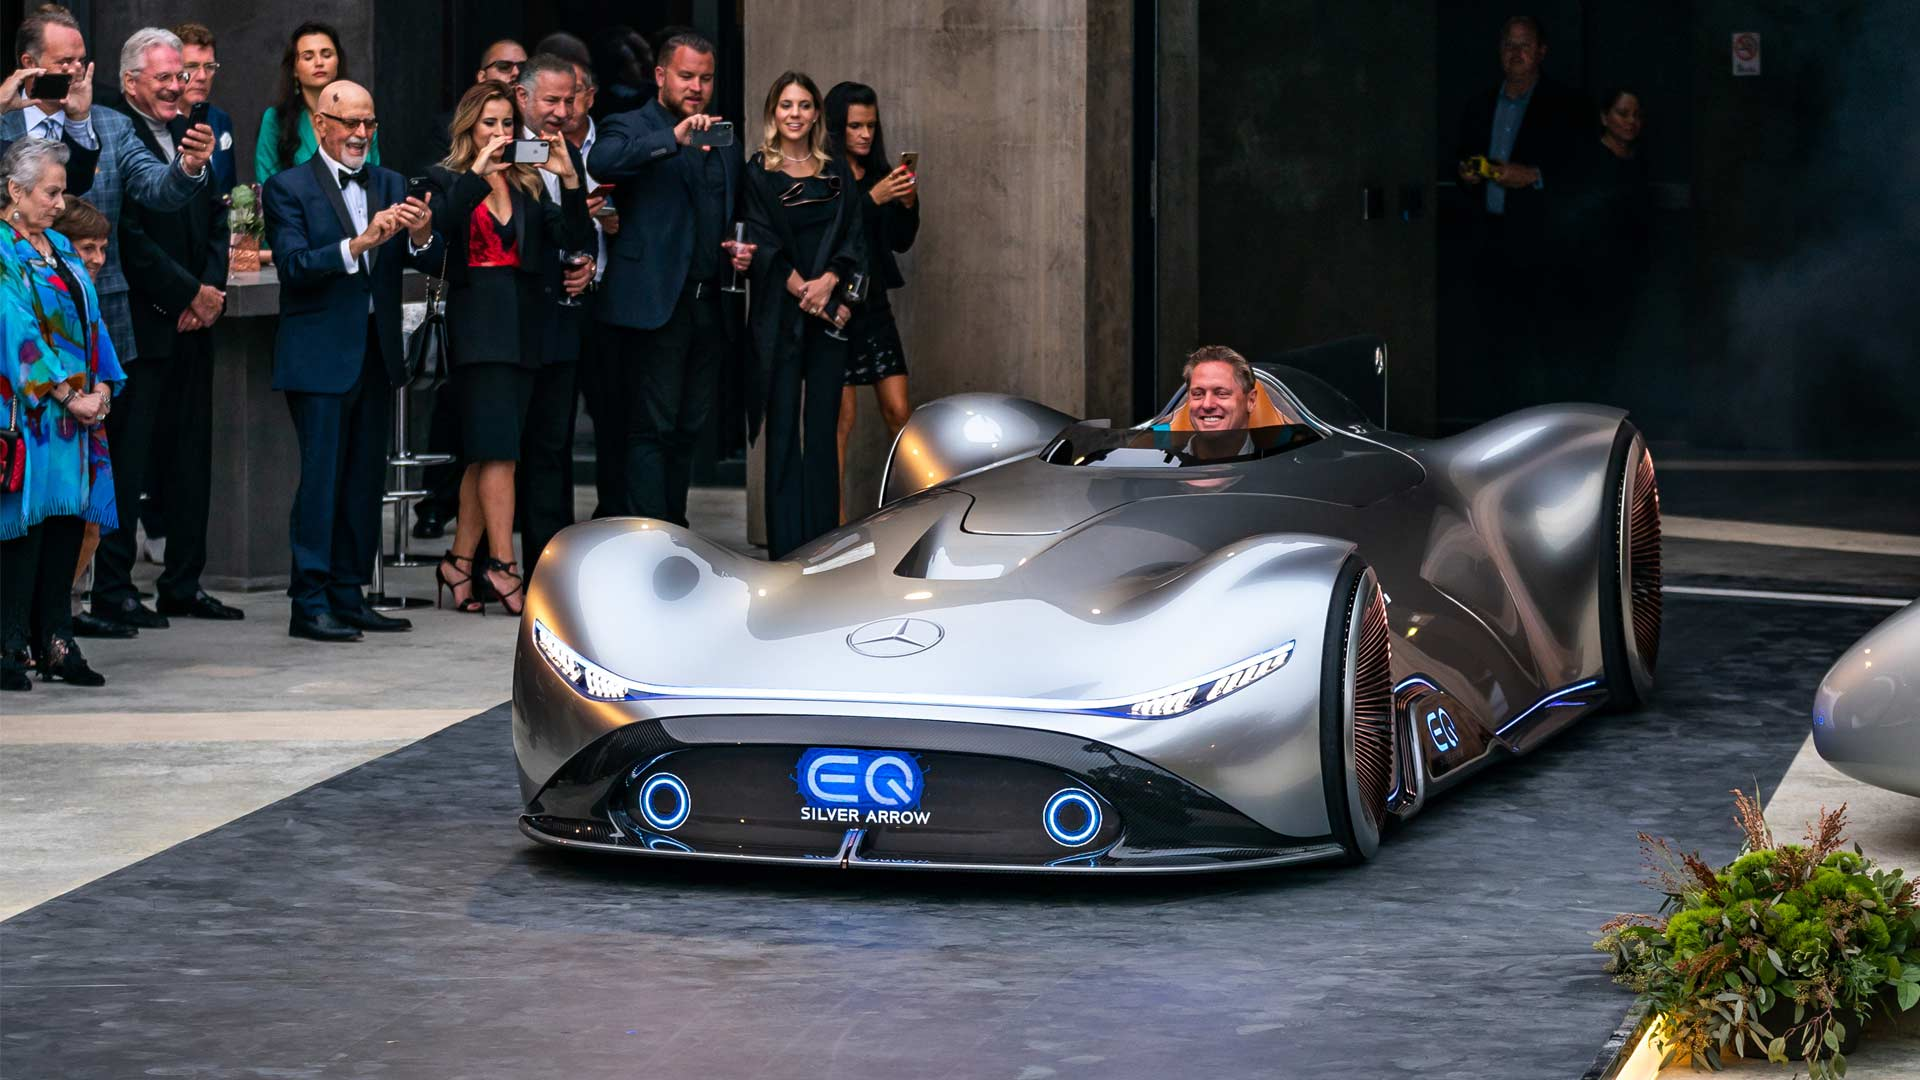 Mercedes Benz Vision Eq Silver Arrow